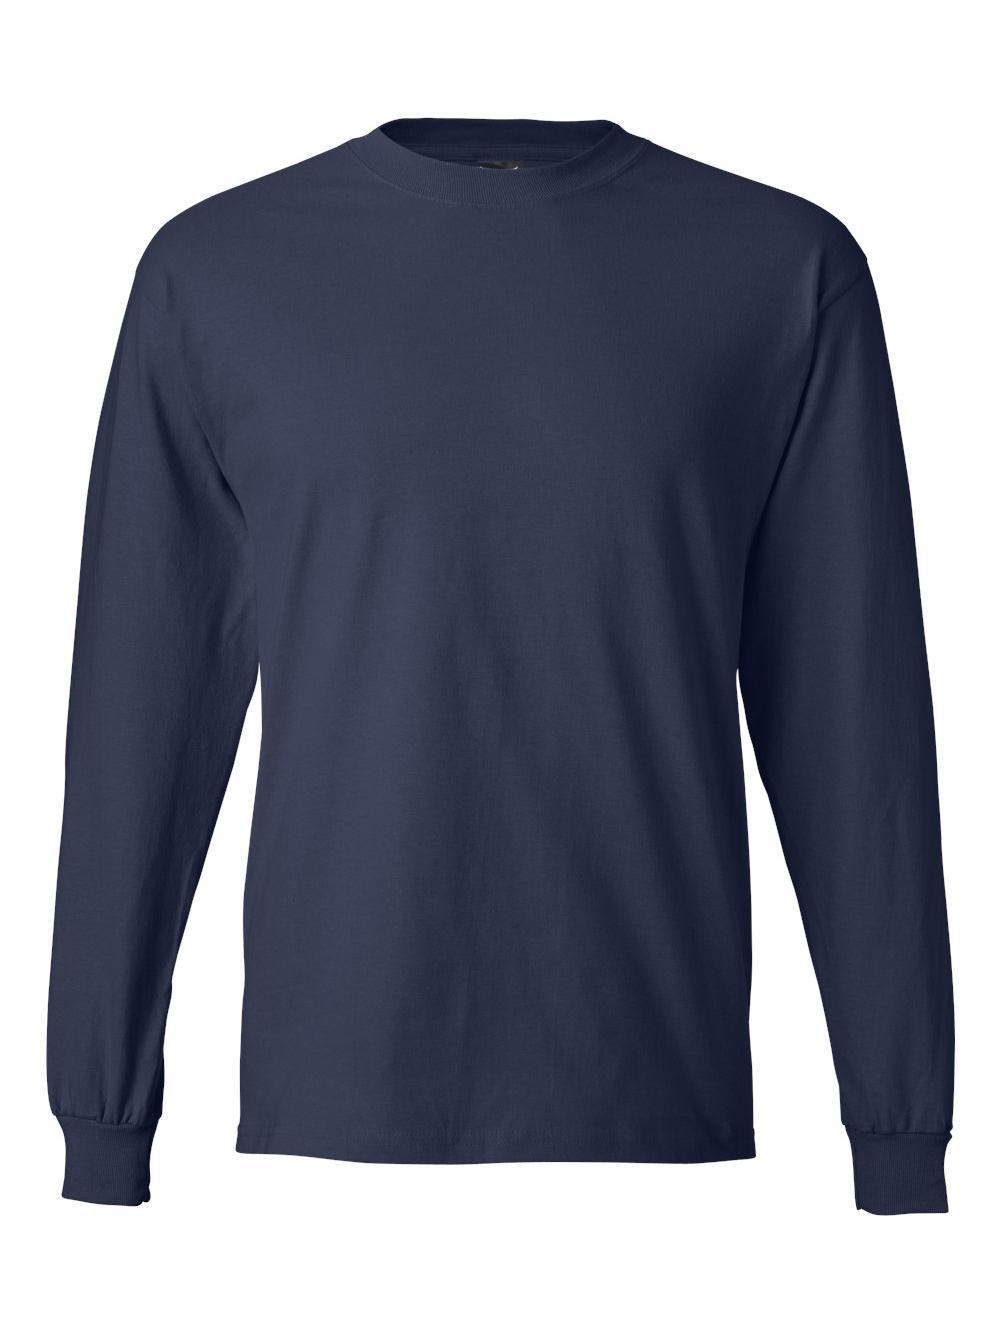 Hanes-Beefy-T-Long-Sleeve-T-Shirt-5186 thumbnail 39